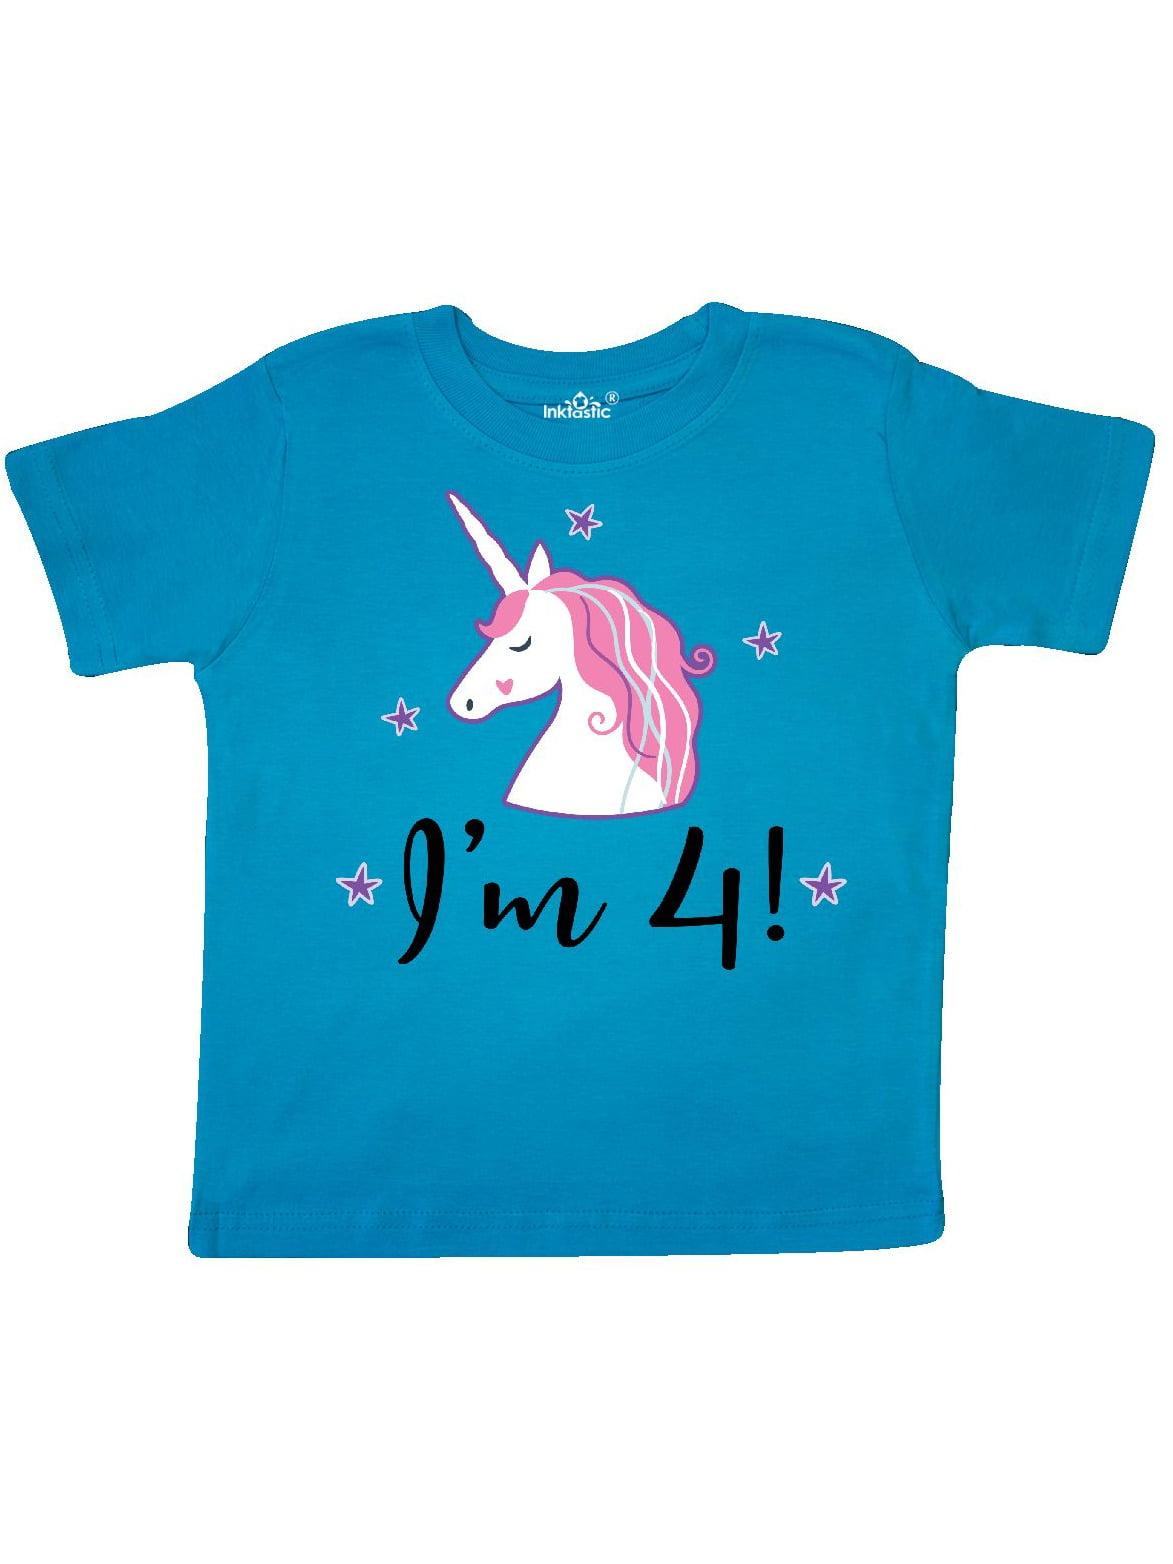 4th Birthday Girls Cute Unicorn Toddler T-Shirt